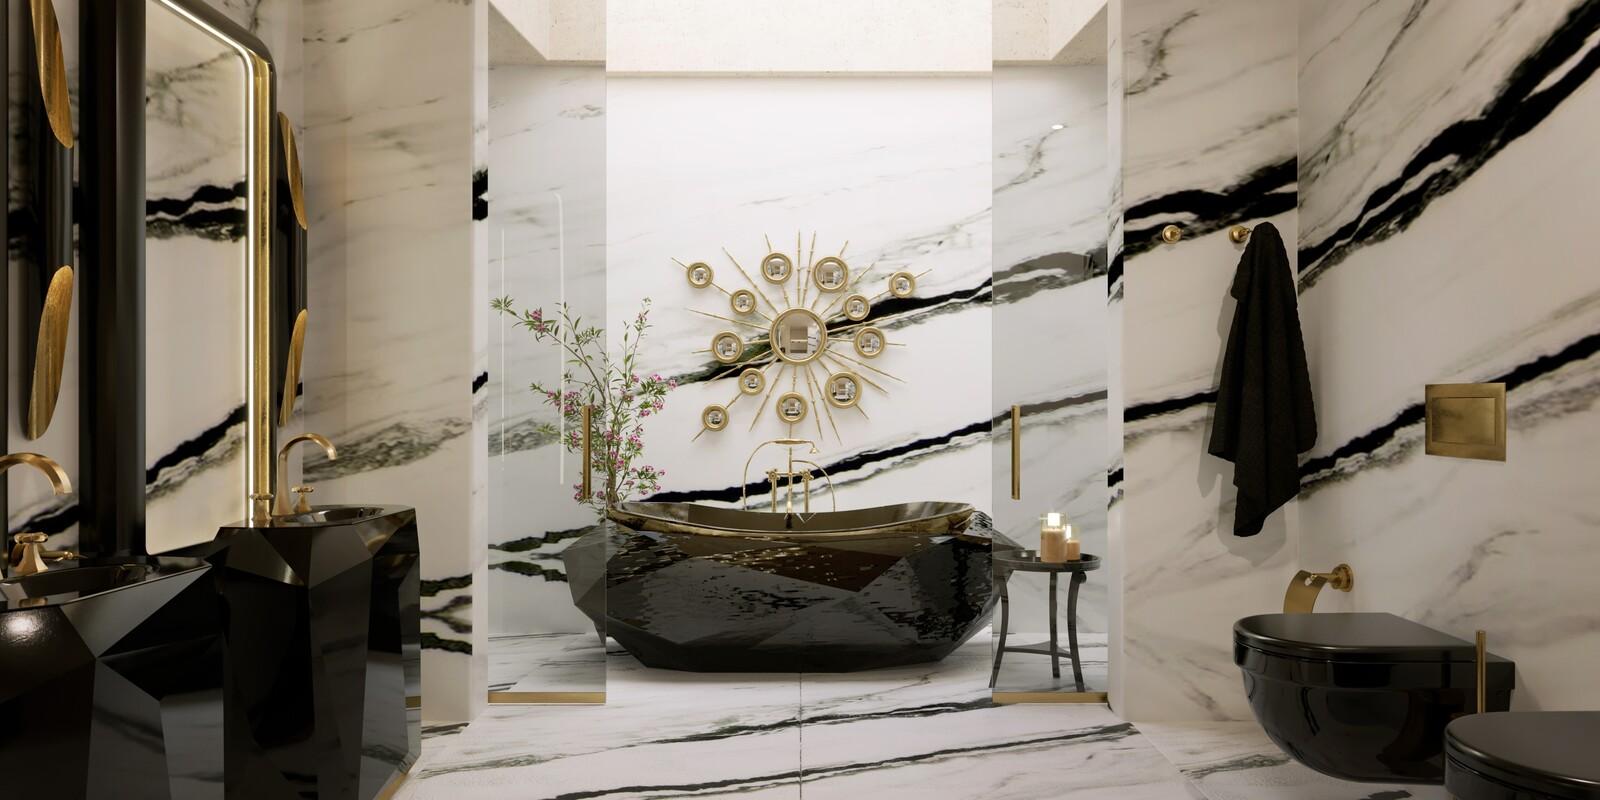 Gold Bathrooms: The Most Shining Designs gold bathrooms Gold Bathrooms: The Most Shining Designs master bathroom with diamond bathtub and diamond freestandings 1